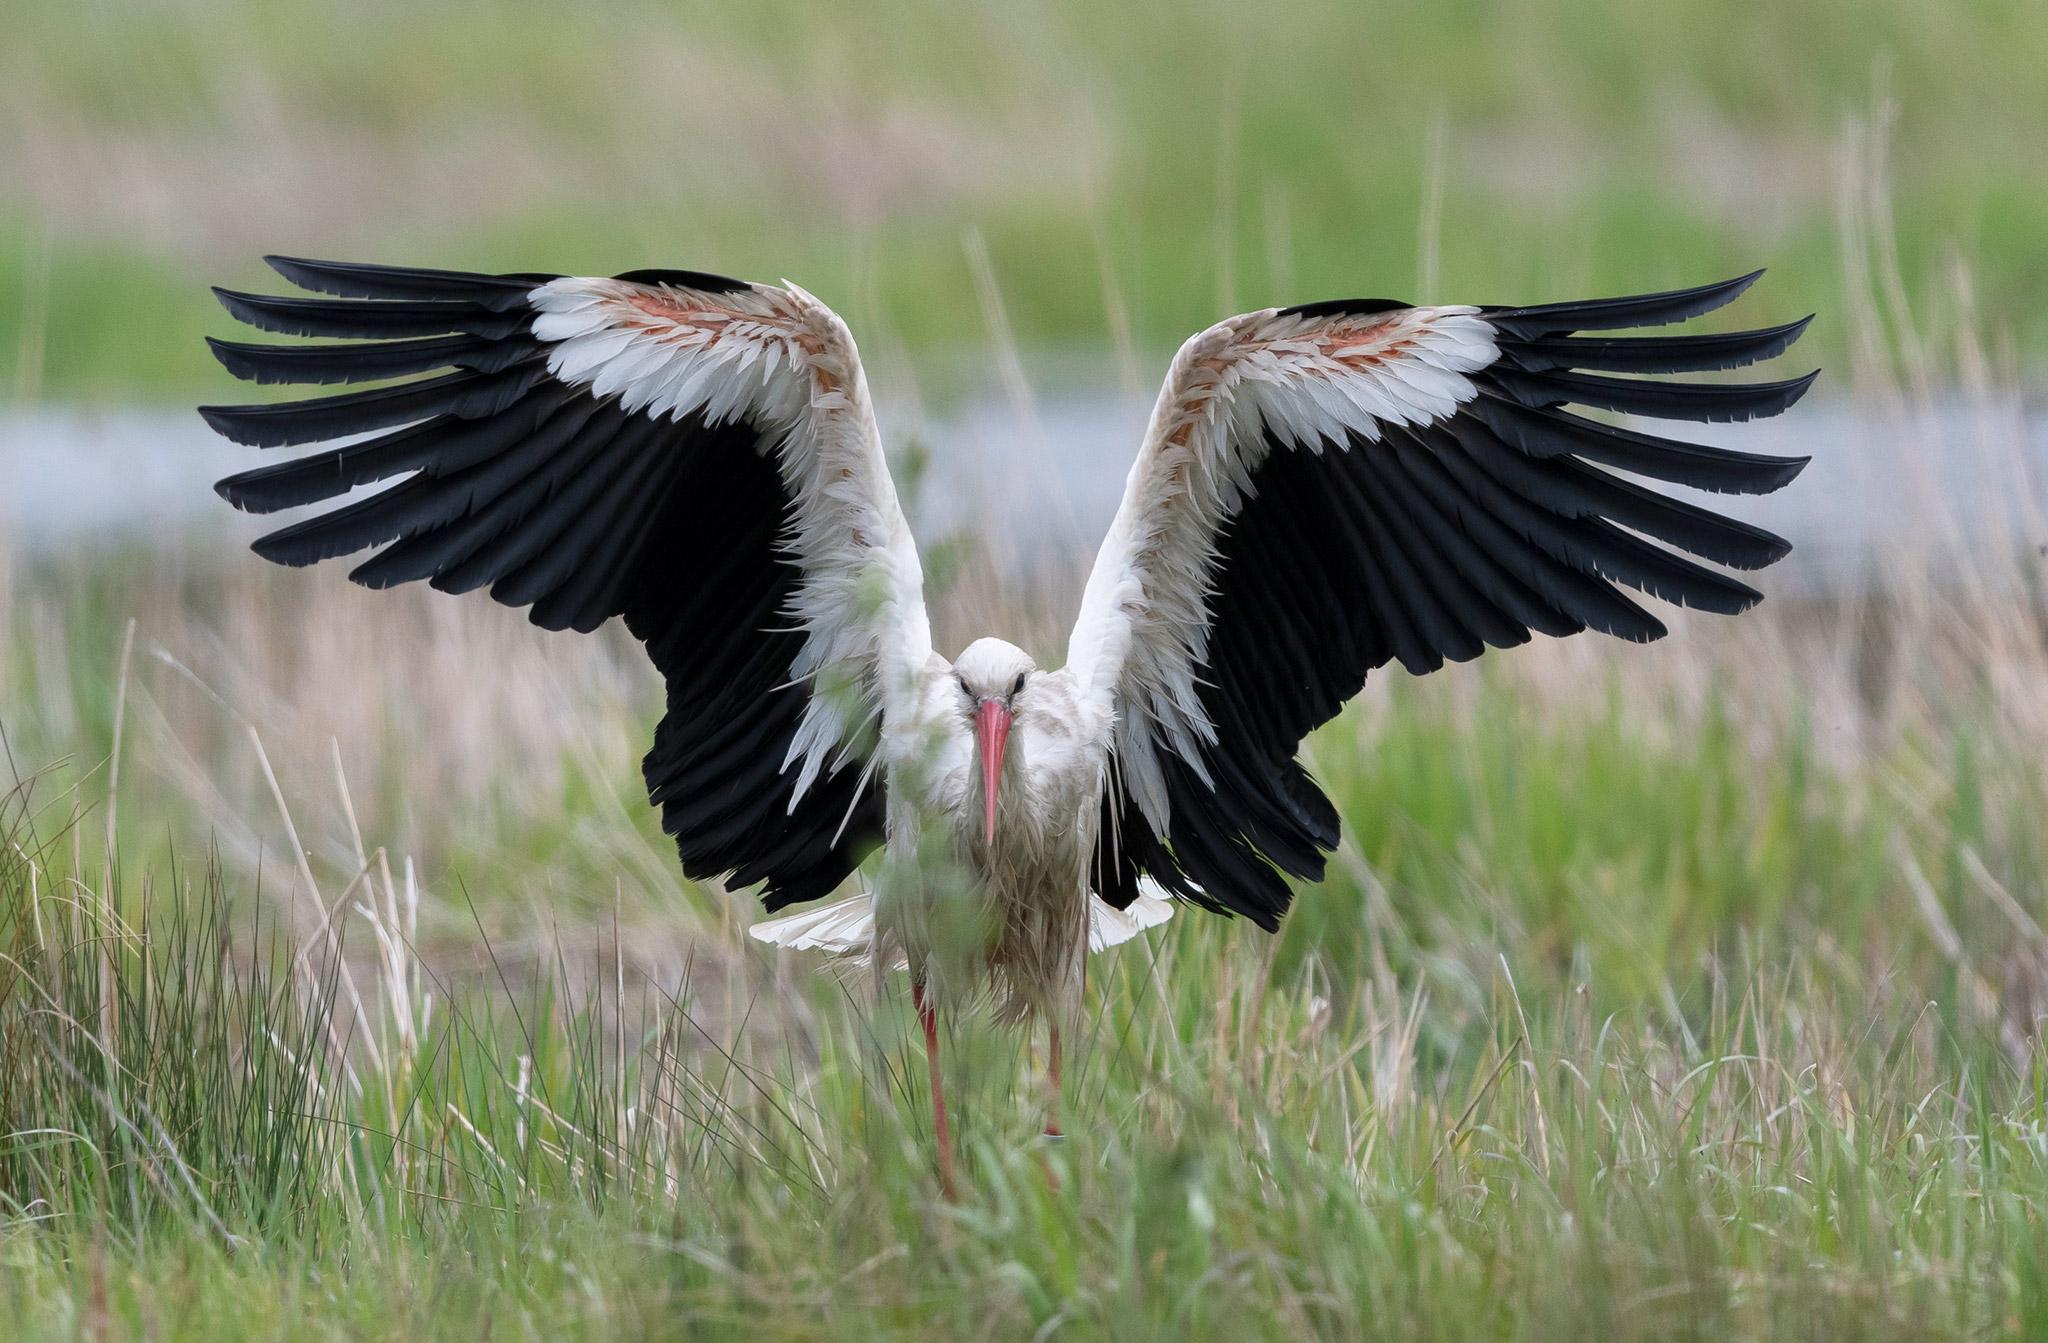 Cigogne blanche (Ciconia ciconia) séchage des ailes après la toilette - White Stork